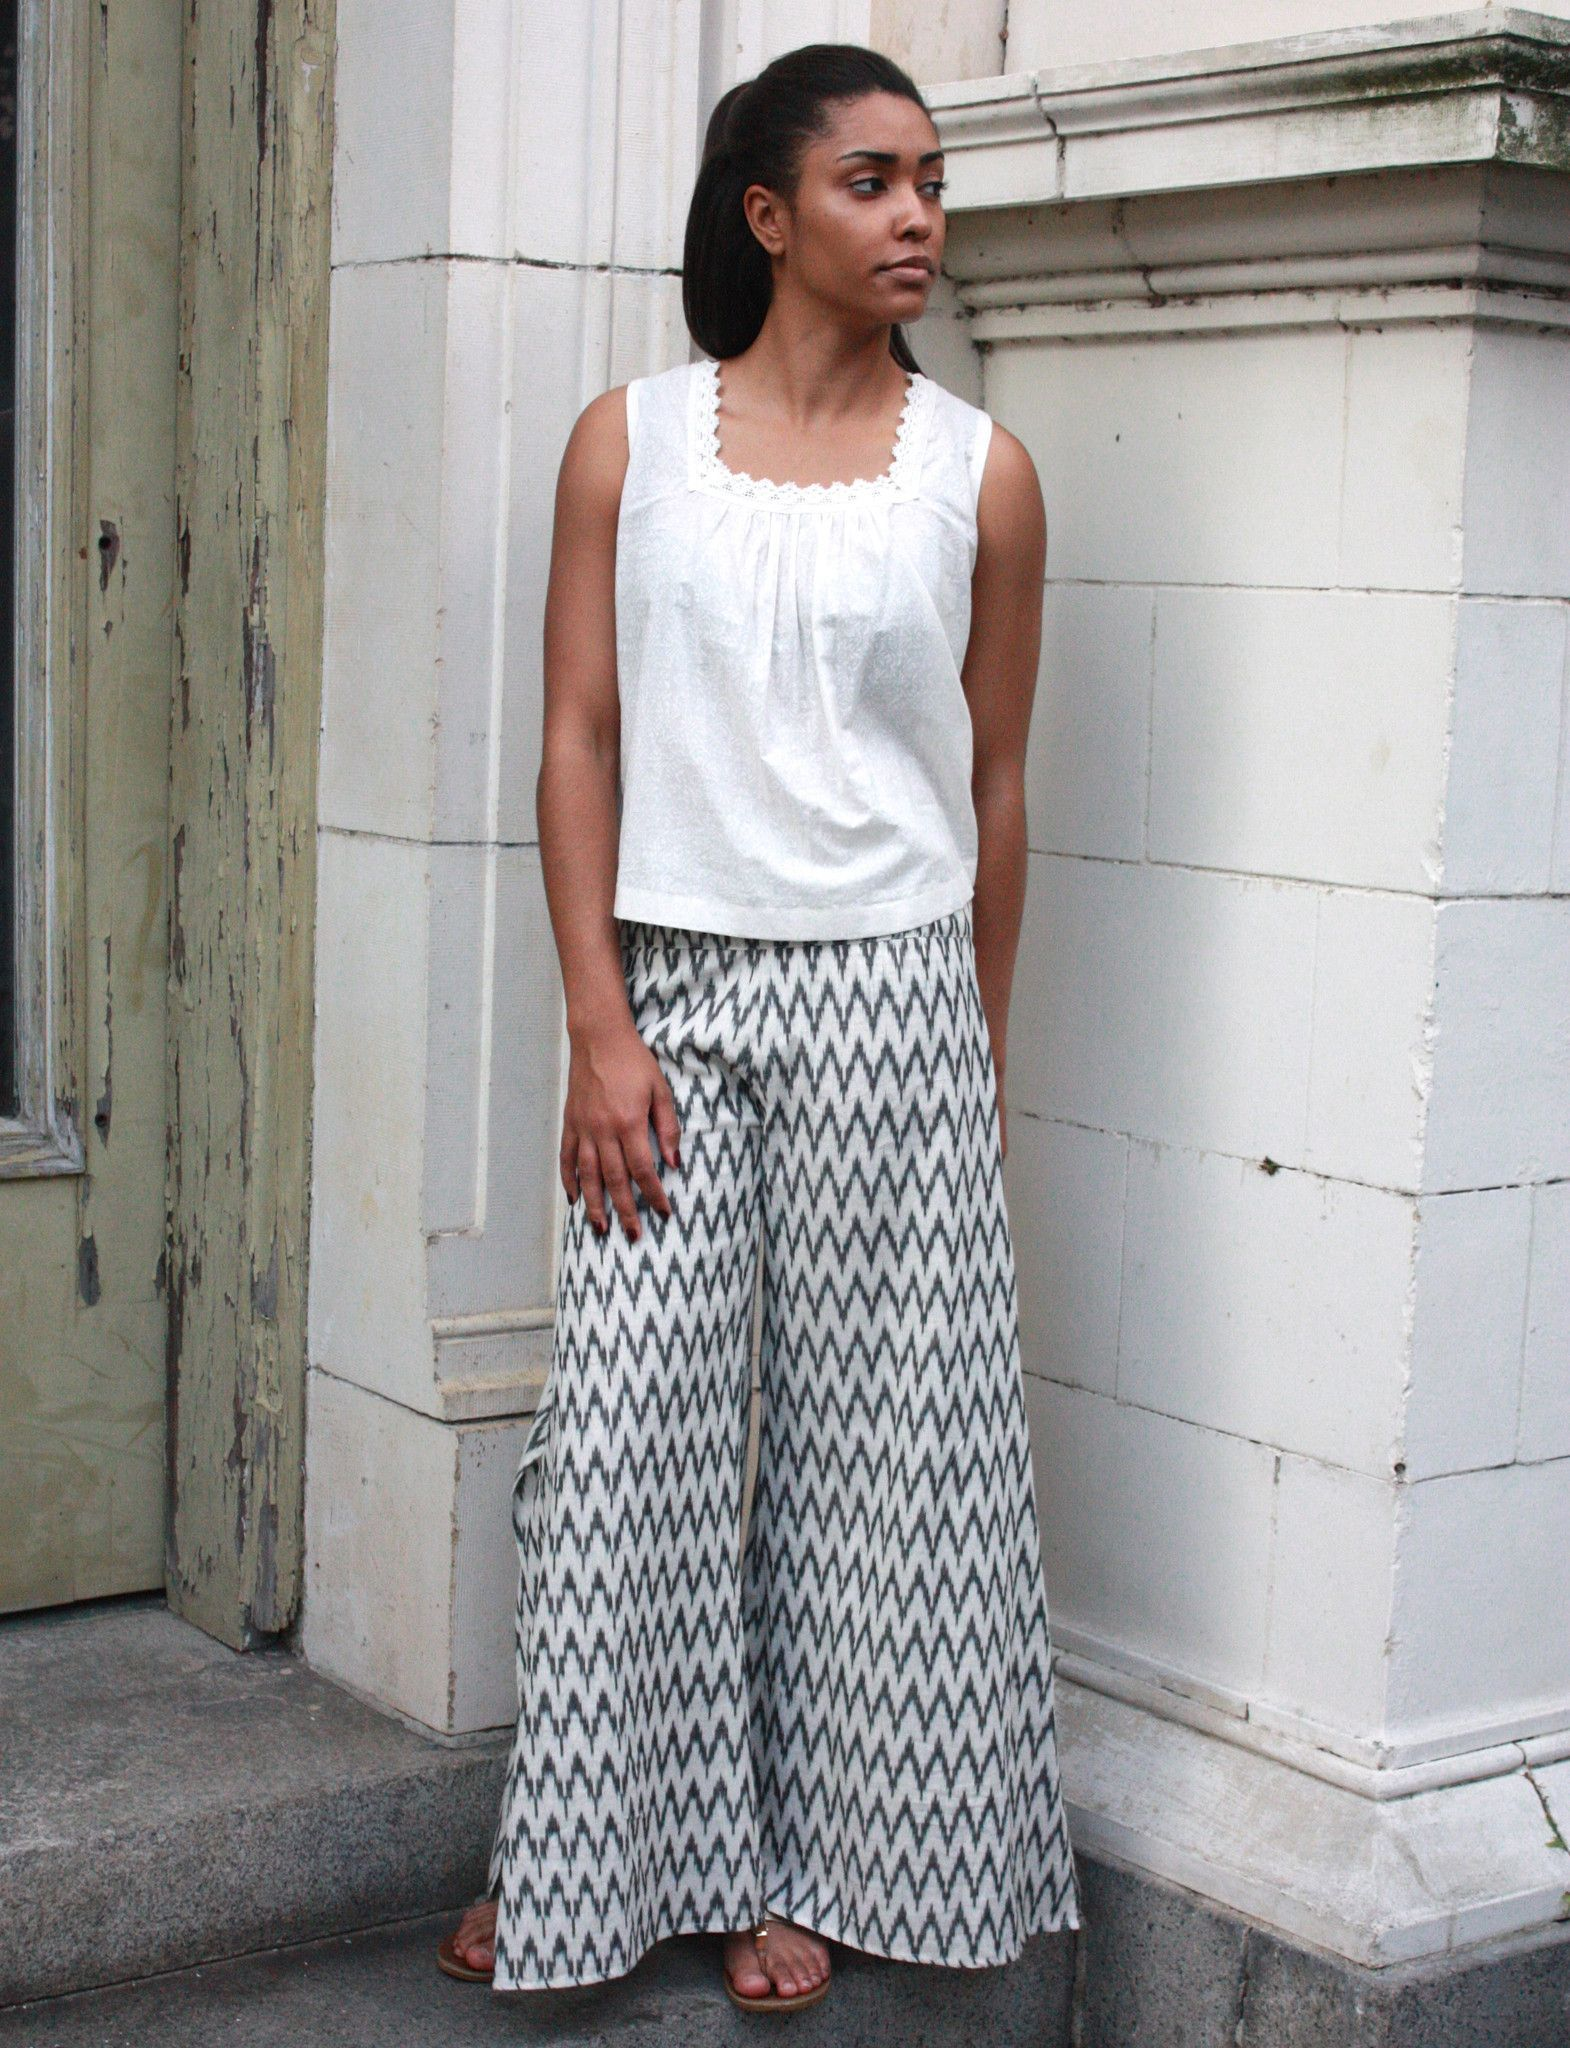 pants - Jessica Debanne.jpg